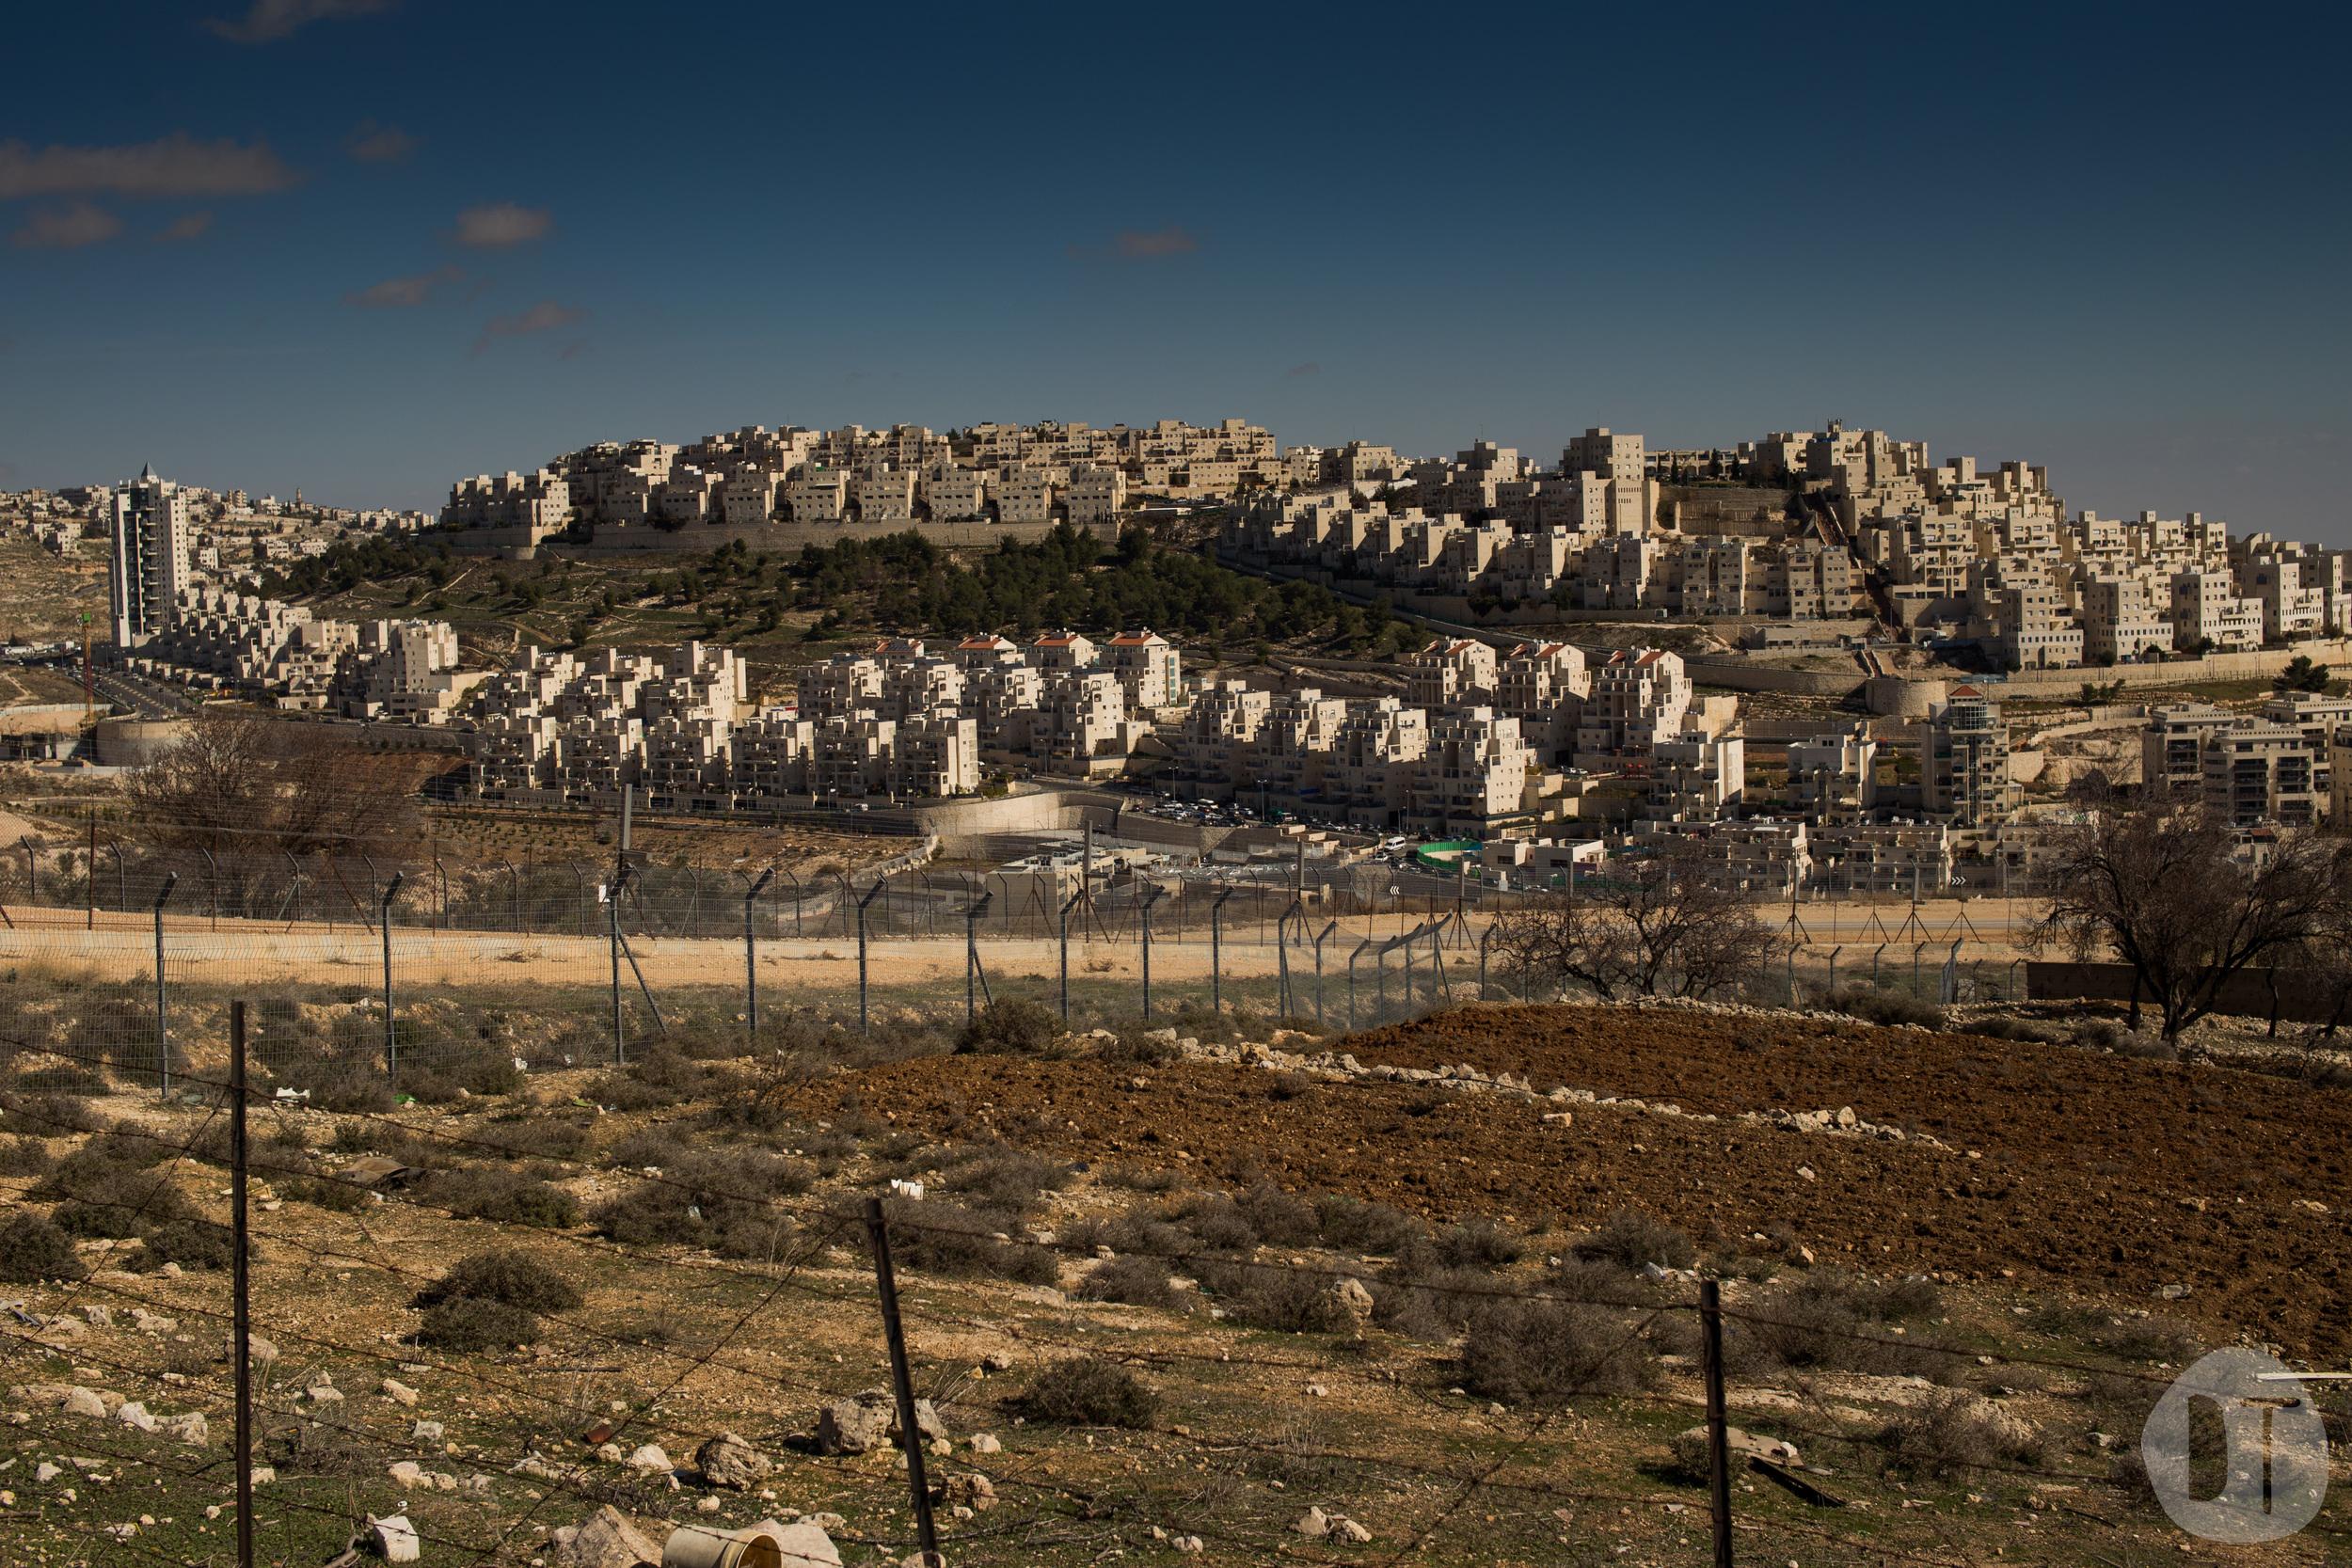 A Jewish settlement on the outskirts of Bethlehem